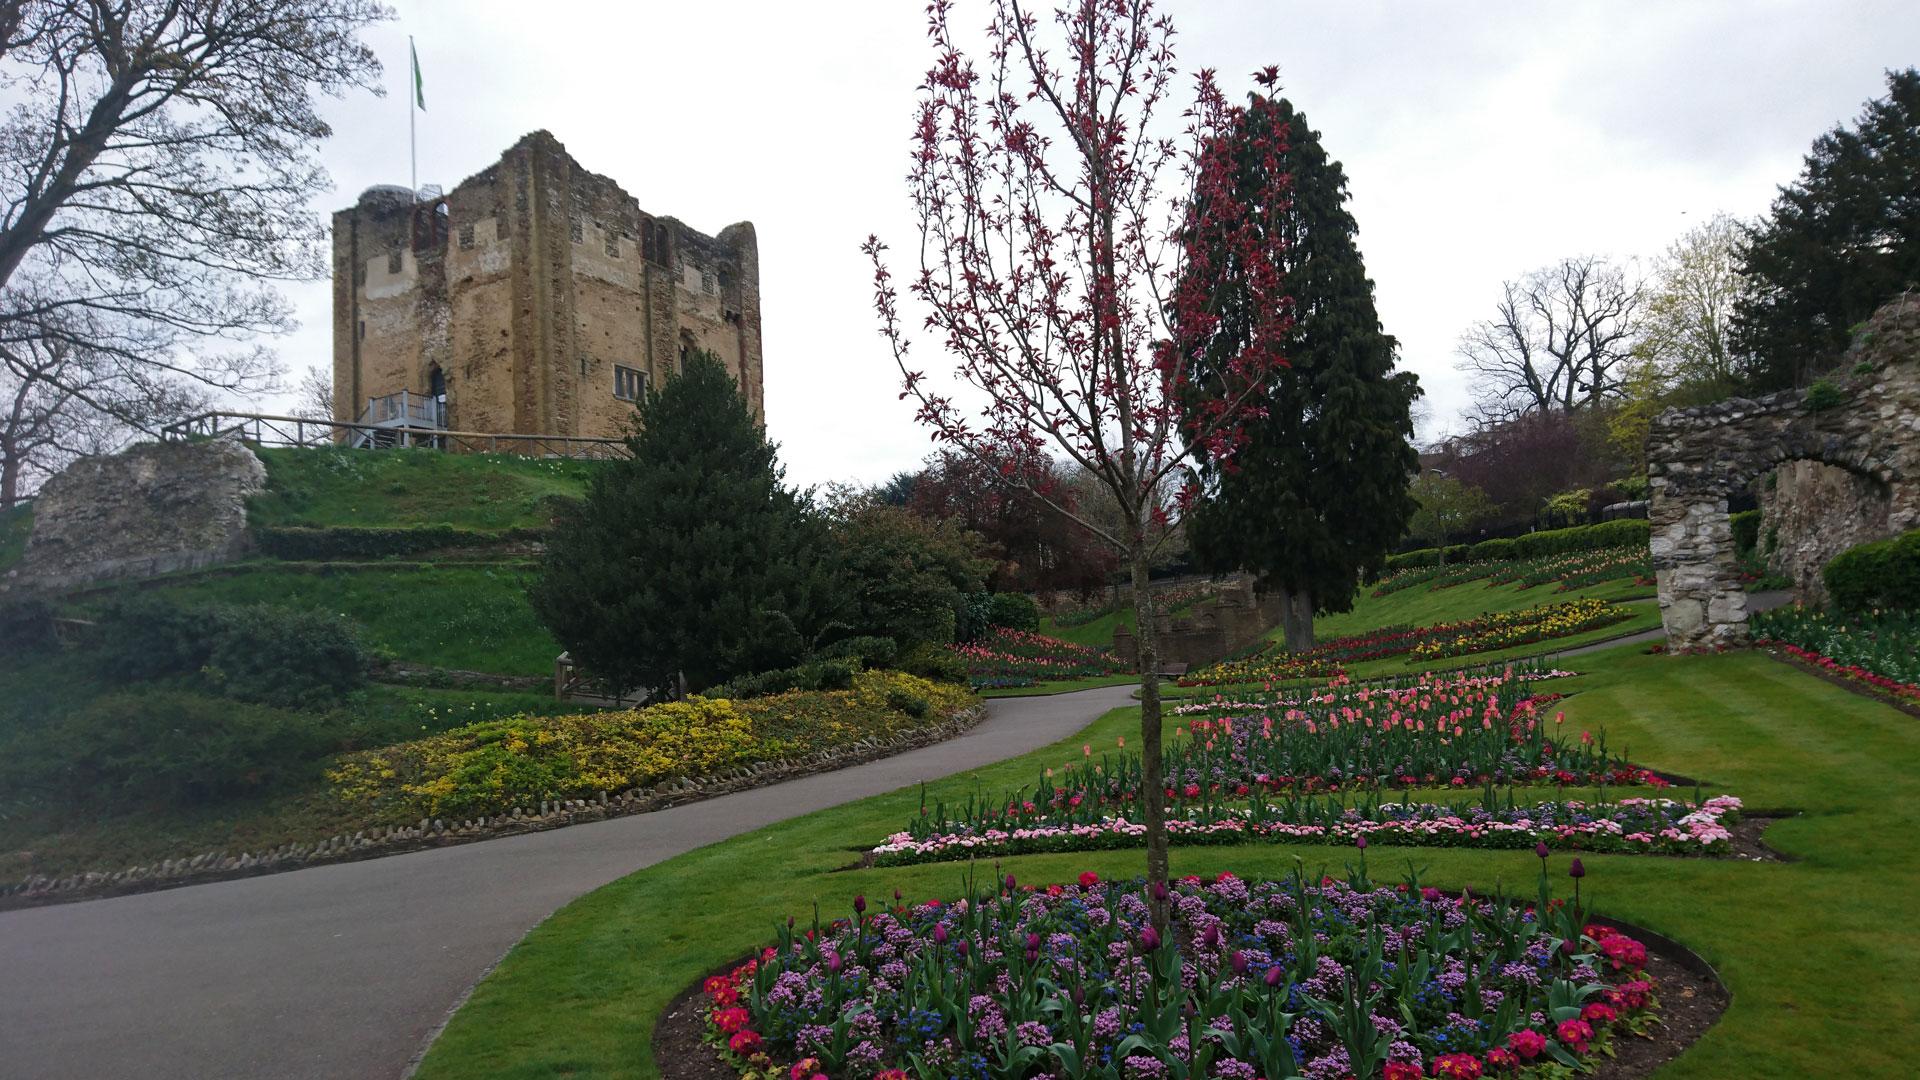 Le château de Guildfrod